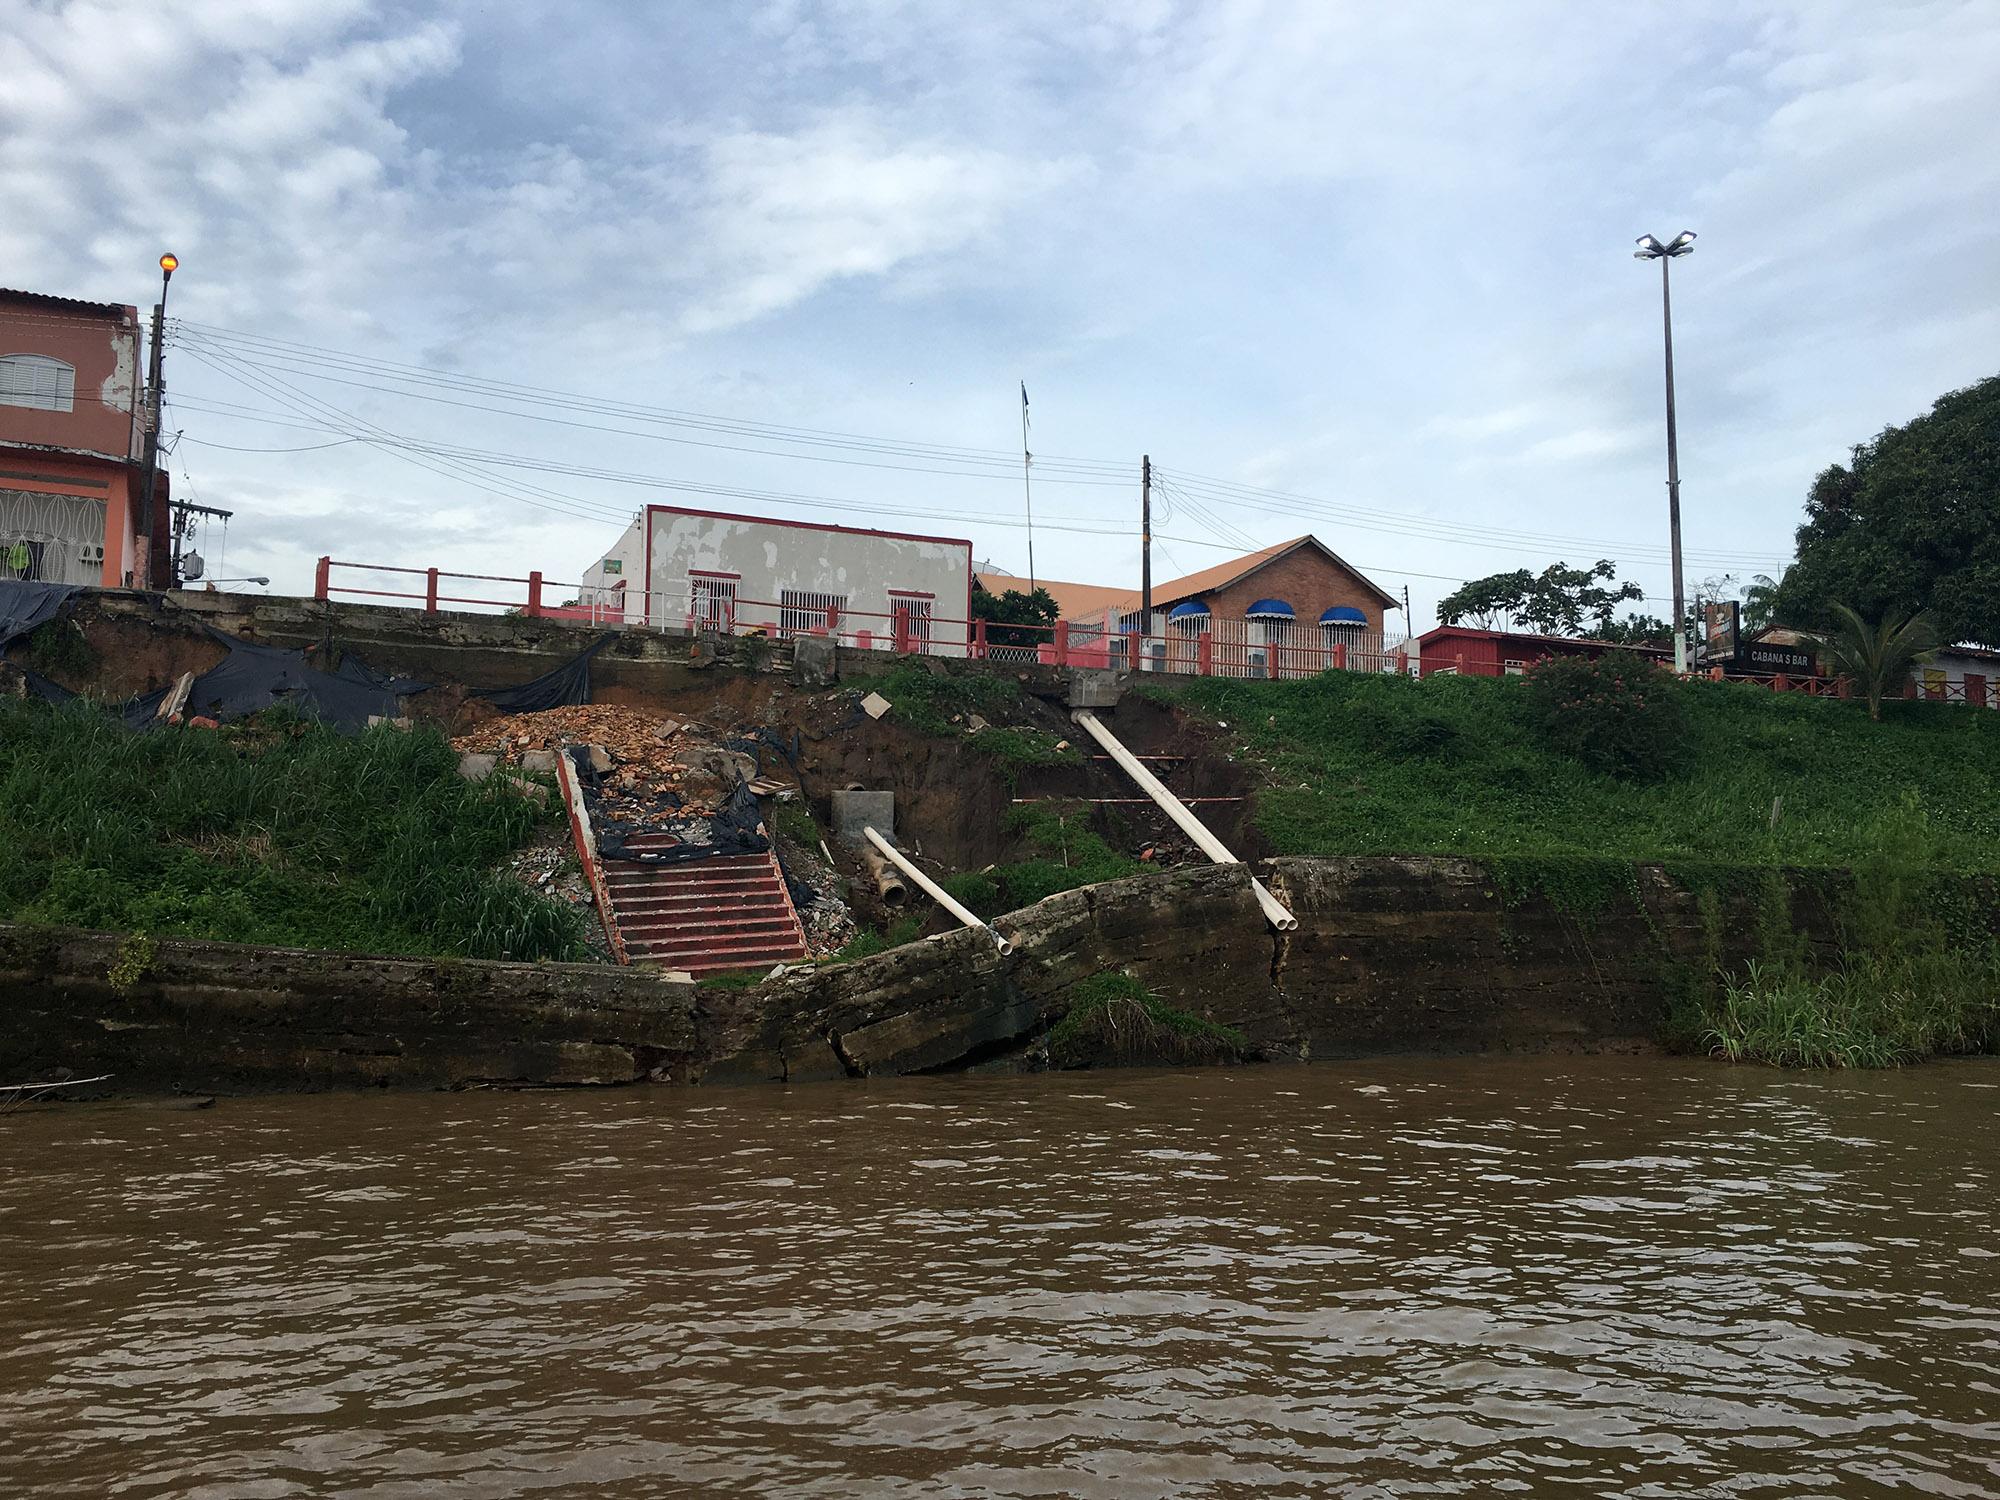 Escadaria próximo ao Cabanas afetadas pelo fenômeno Terras caídas (Foto:  Marcelo Barrios)